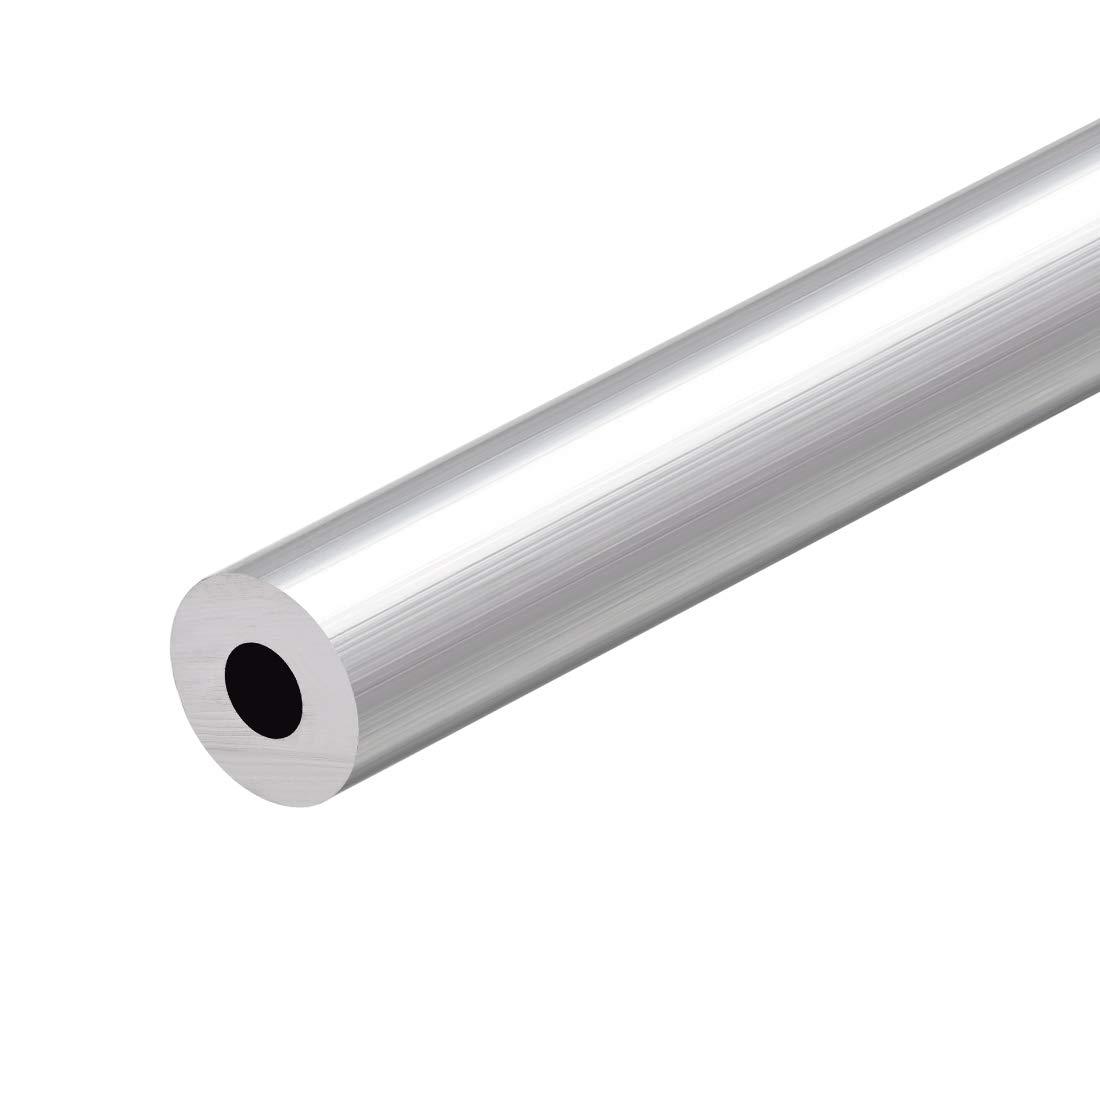 sourcing map 6063 Aluminio Redondo Tubo 300mm Longitud 18mm OD 5-15mm Di/ámetro Interior Sin Costura Aluminio Recto Tuber/ía ID de 8 mm x 17 mm de di/ámetro exterior 3 piezas